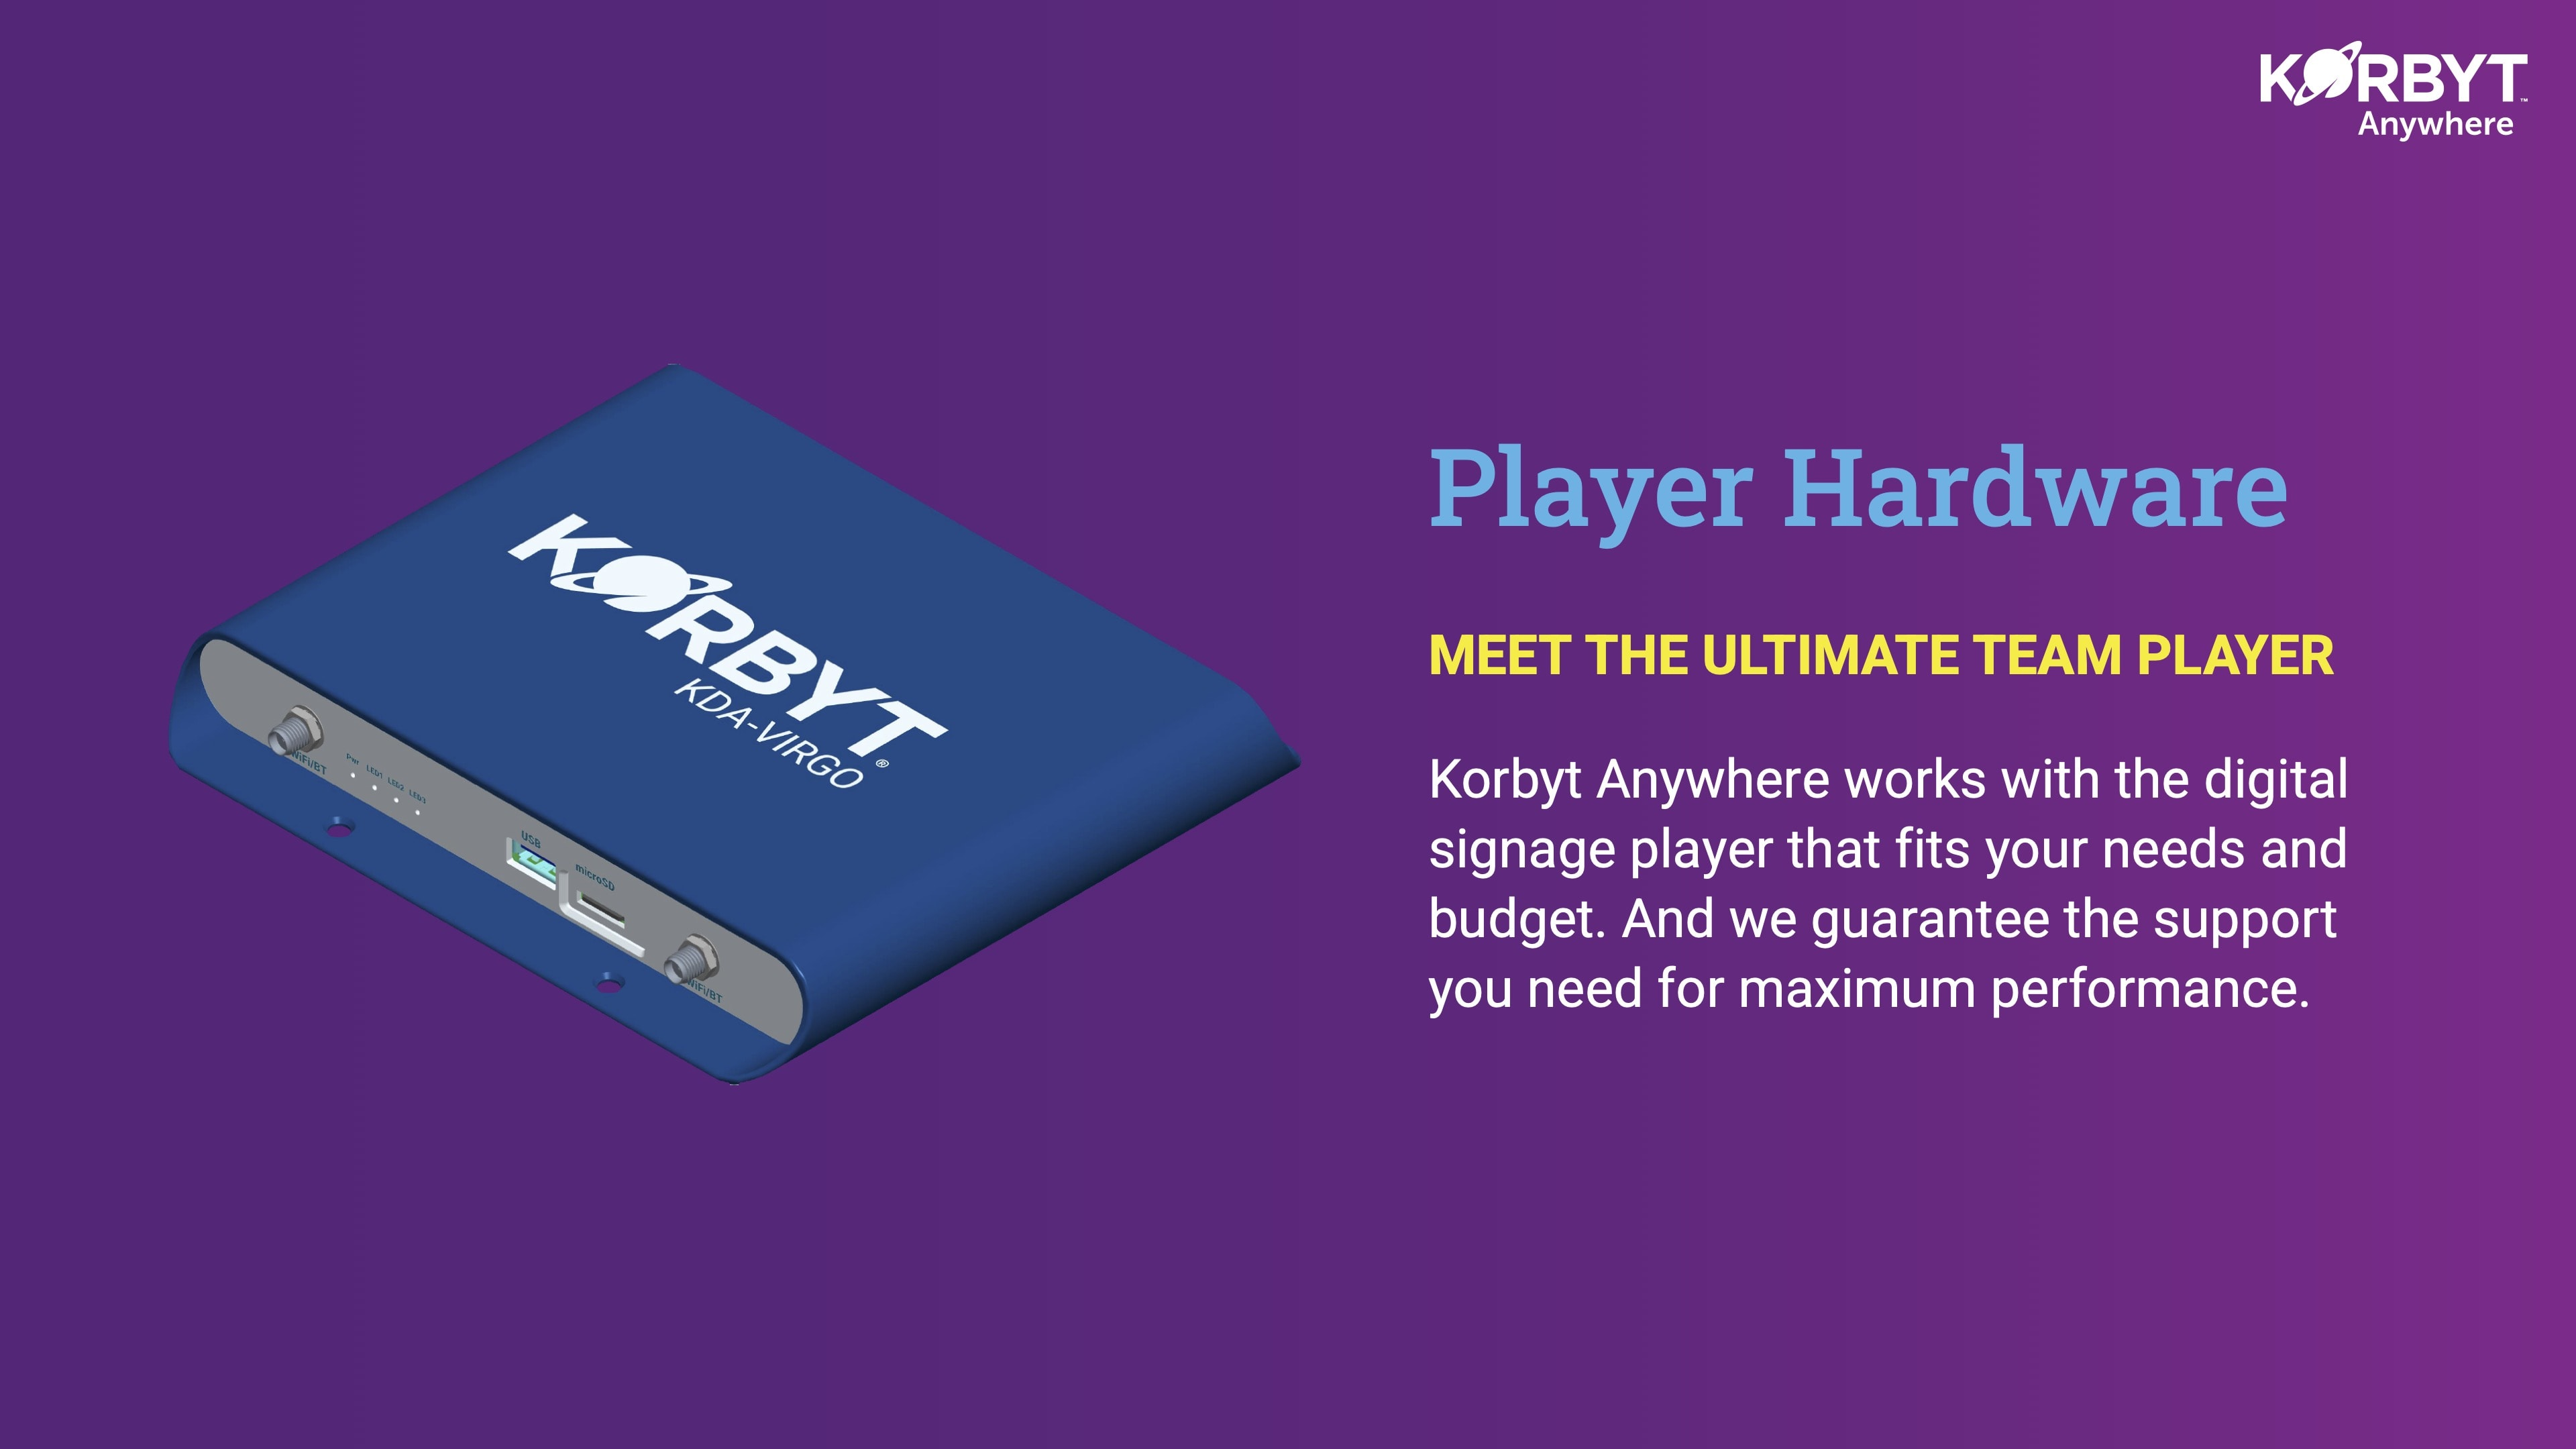 player hardware